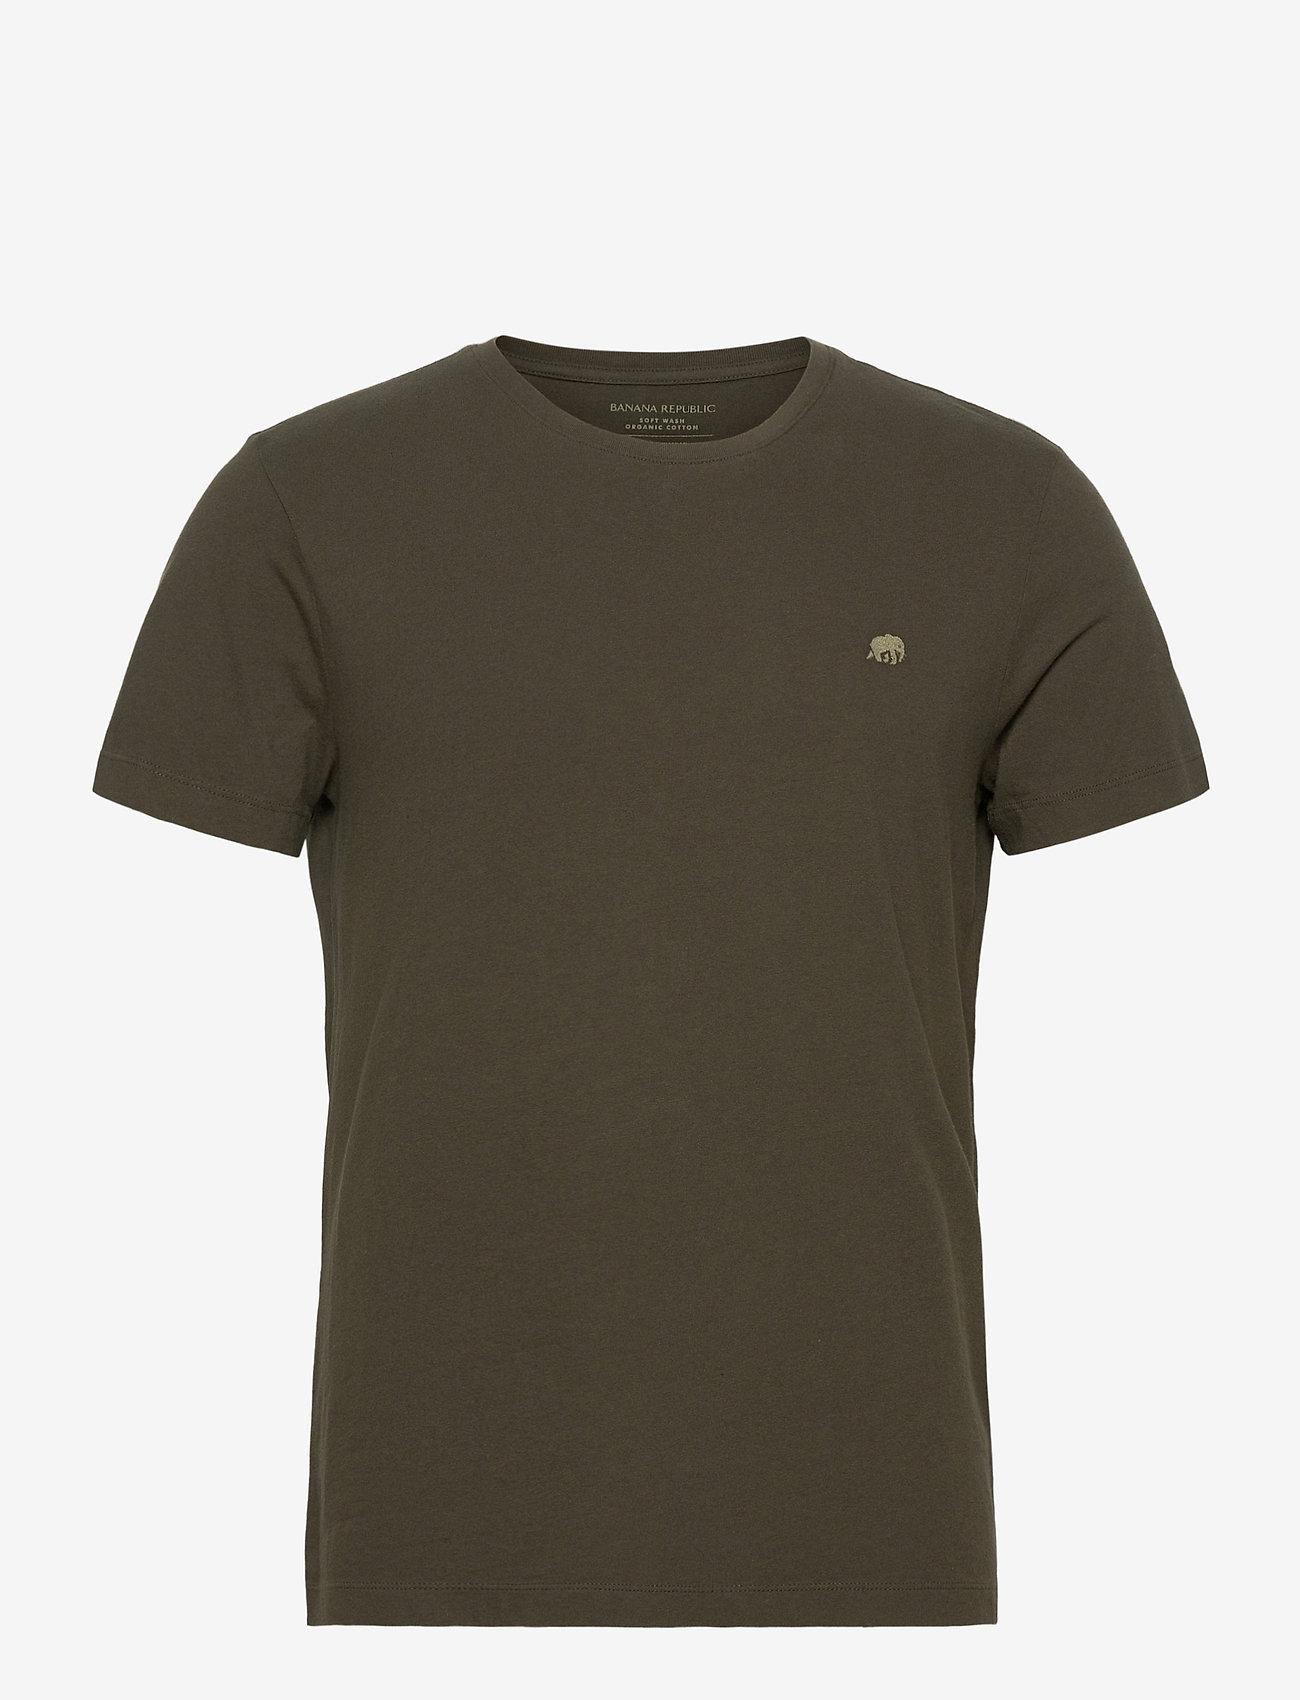 Banana Republic - I LOGO SOFTWASH ORGANIC TEE - basic t-shirts - nightshade global - 0